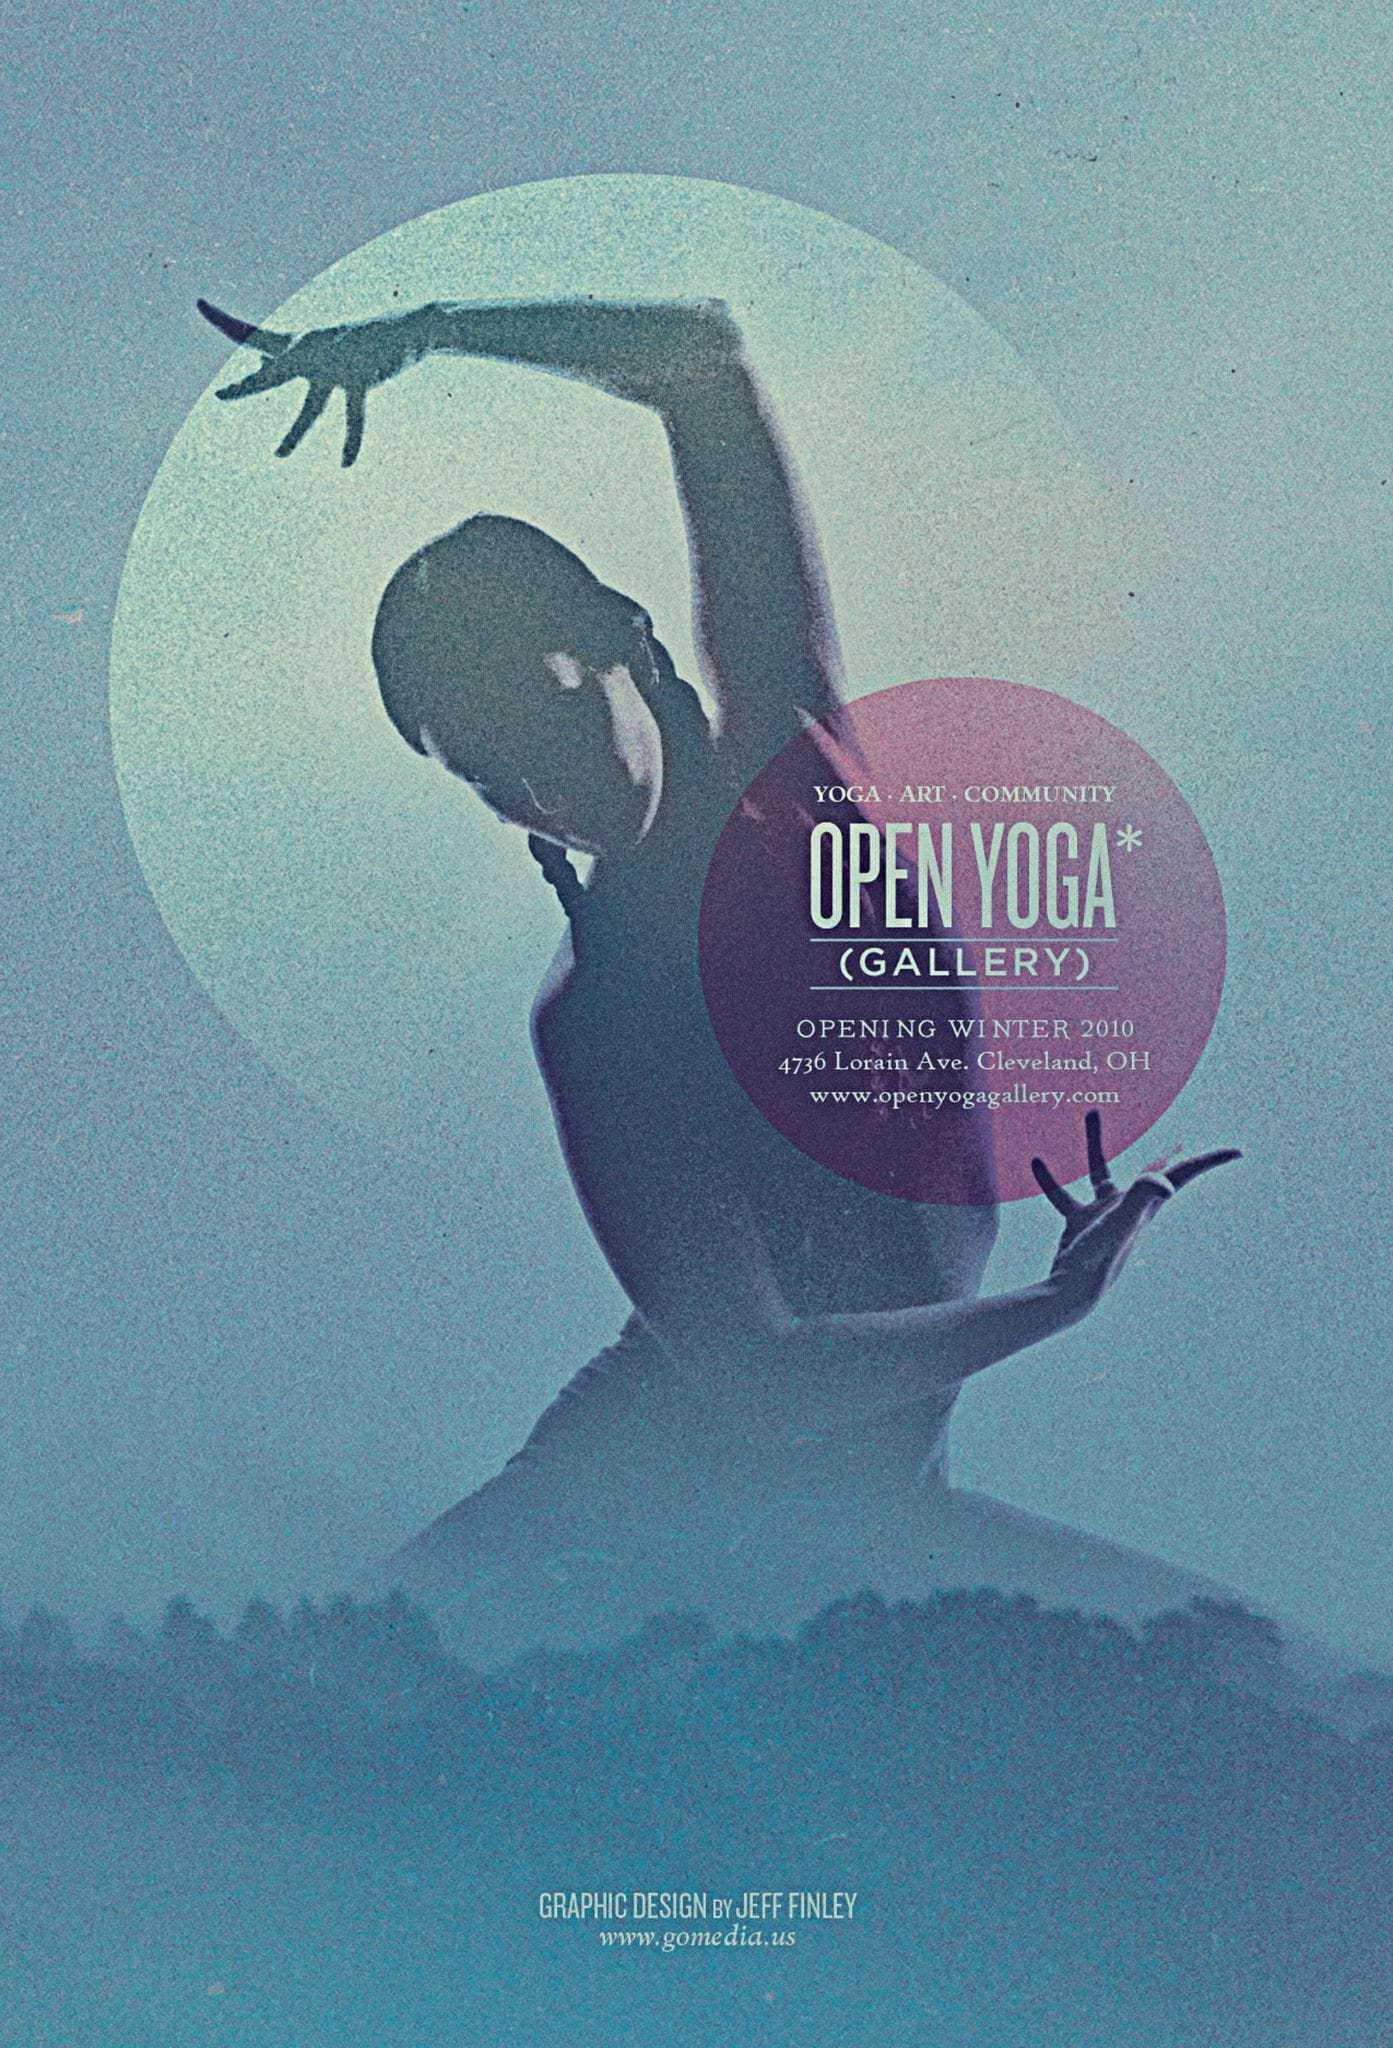 Open Yoga gallery